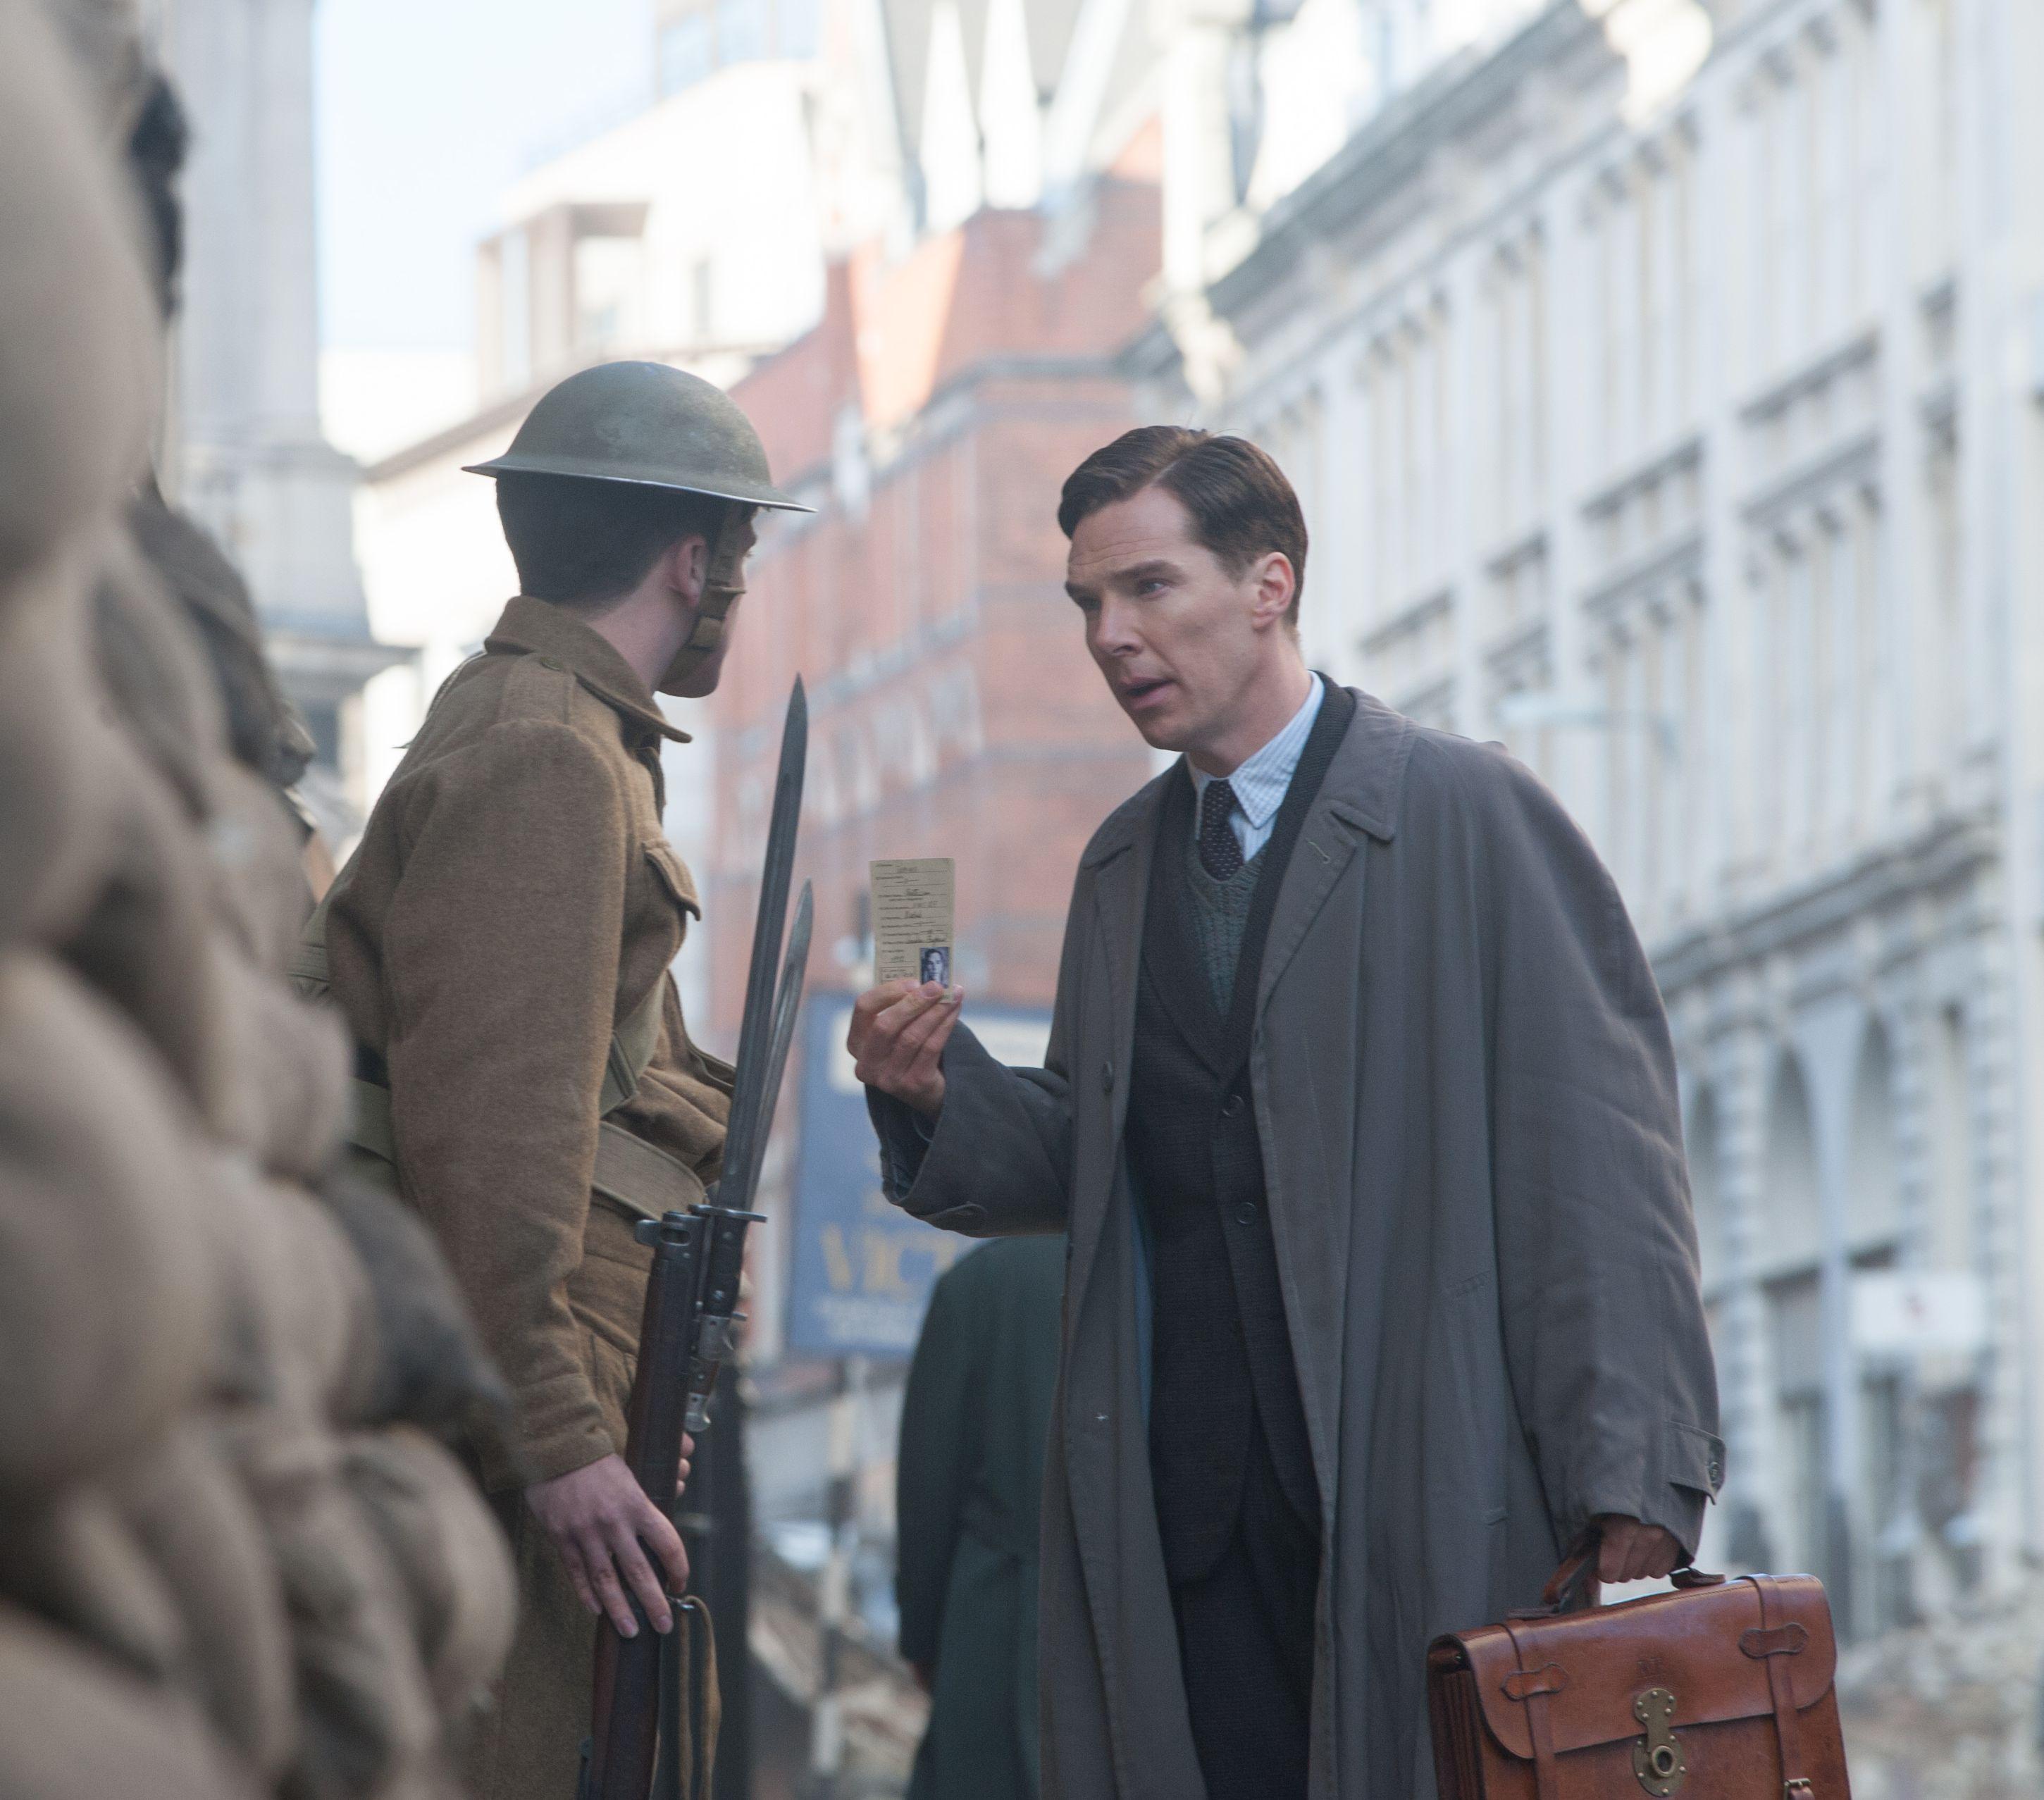 Benedict Cumberbatch during wartime, The Imitation Game